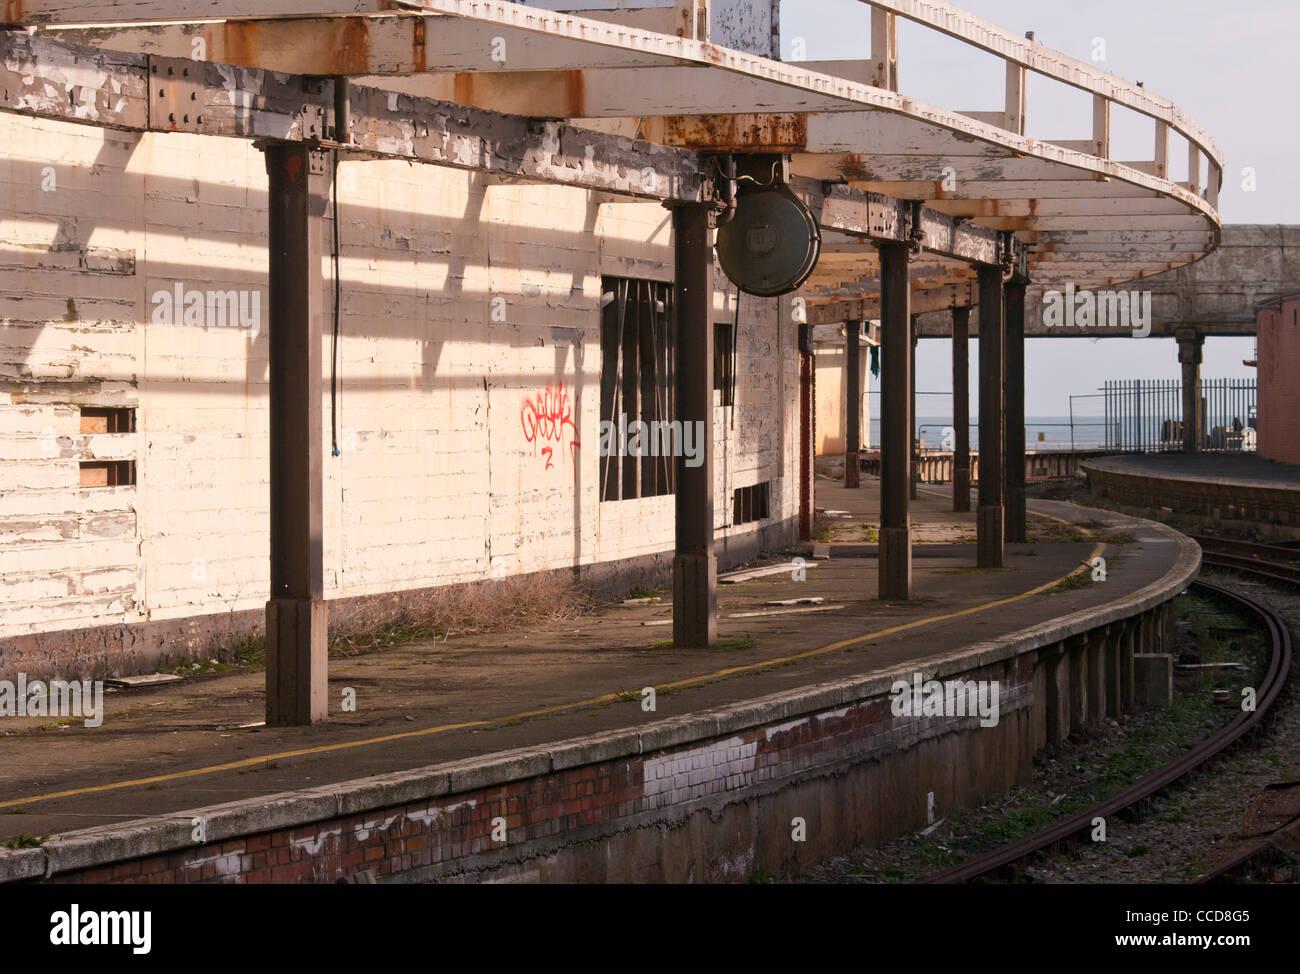 Disused Run Down Closed Railway Lines Track Tracks stations Folkestone Harbour Railway Station Platform Kent UK - Stock Image